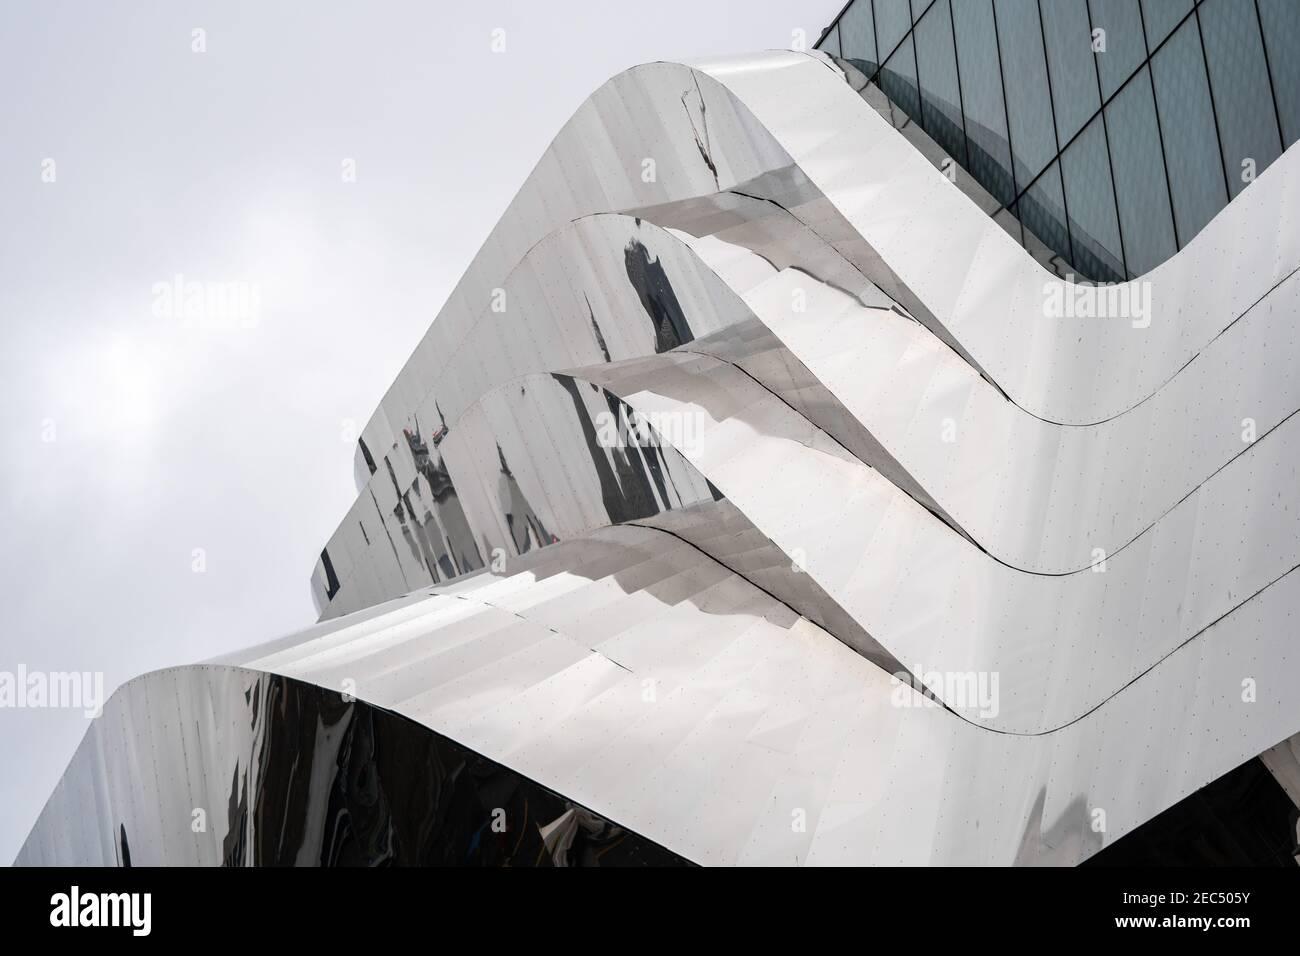 Birmingham John Lewis grand magasin situé à Grand Central Station design moderne en chrome, verre et structure futuriste Banque D'Images